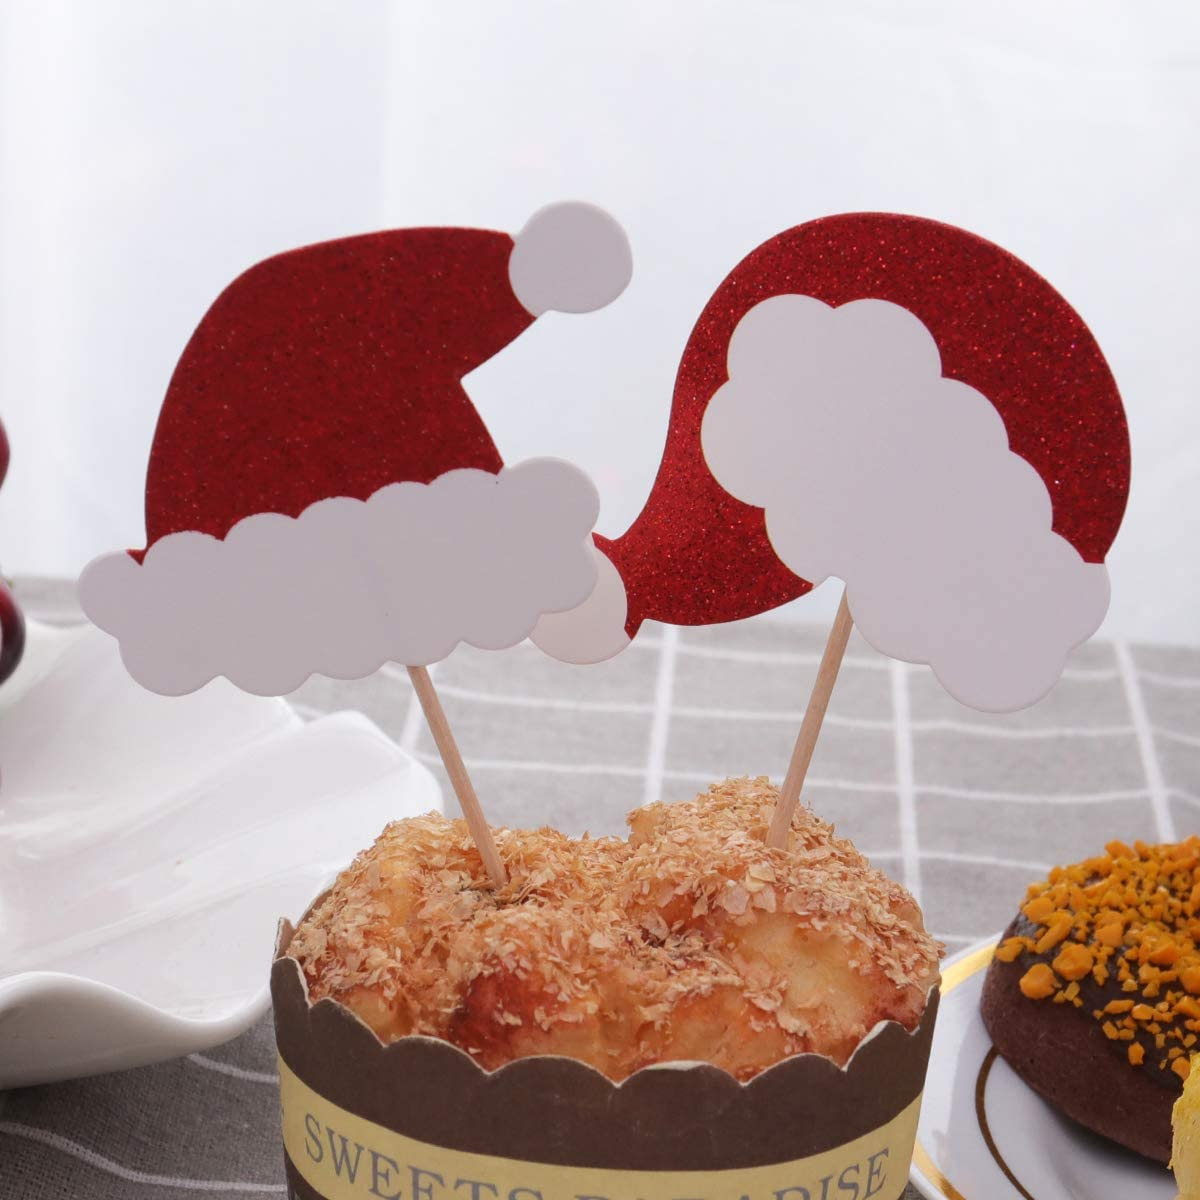 Chrismas Decoration Amosfun 6PCS Christmas Hat Cake Toppers Glitter Decor Cupcake Picks Dessert Toppers Party Favors Supplies Table Decoration